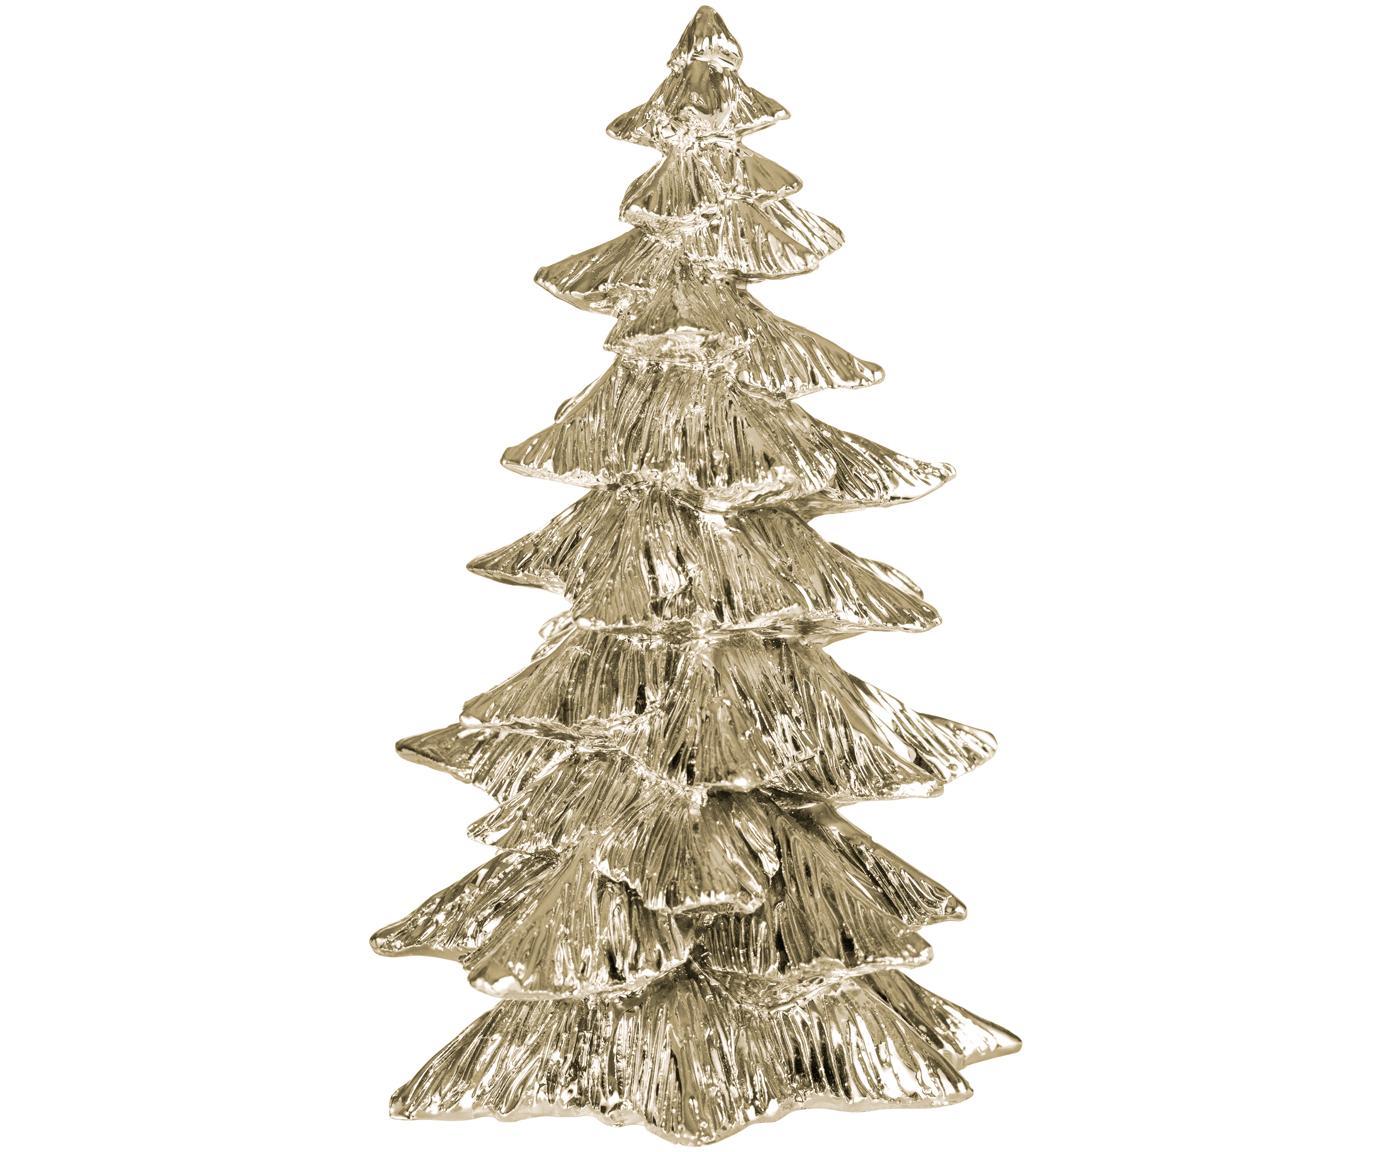 Decoratief object Serafina Christmas Tree, Polyresin, Goudkleurig, Ø 10 x H 15 cm